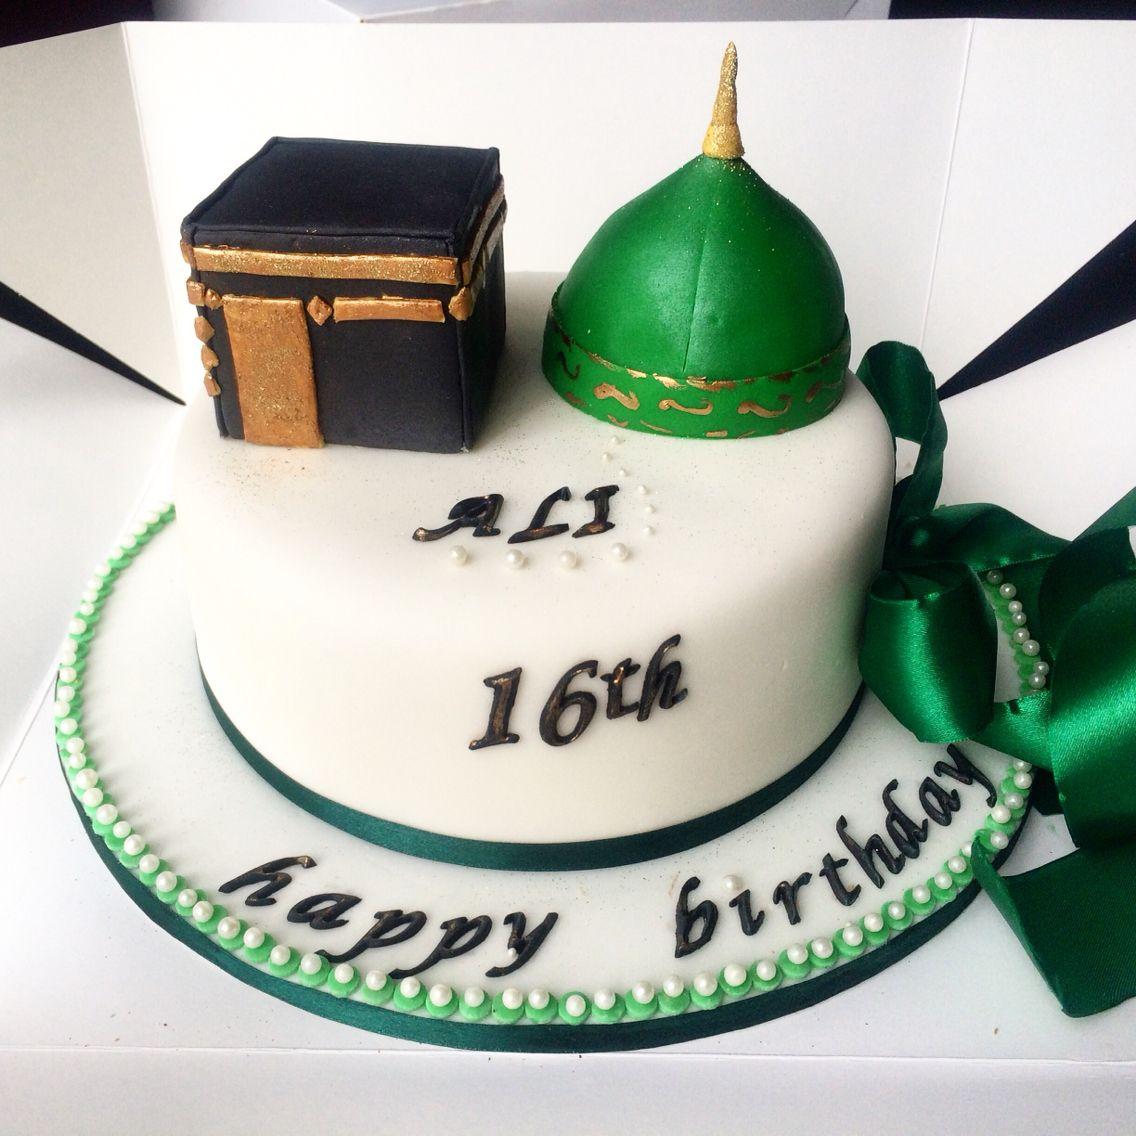 Kaaba Cake, Kaaba Shareef Cake, Mecca Cake, Hajj Cake